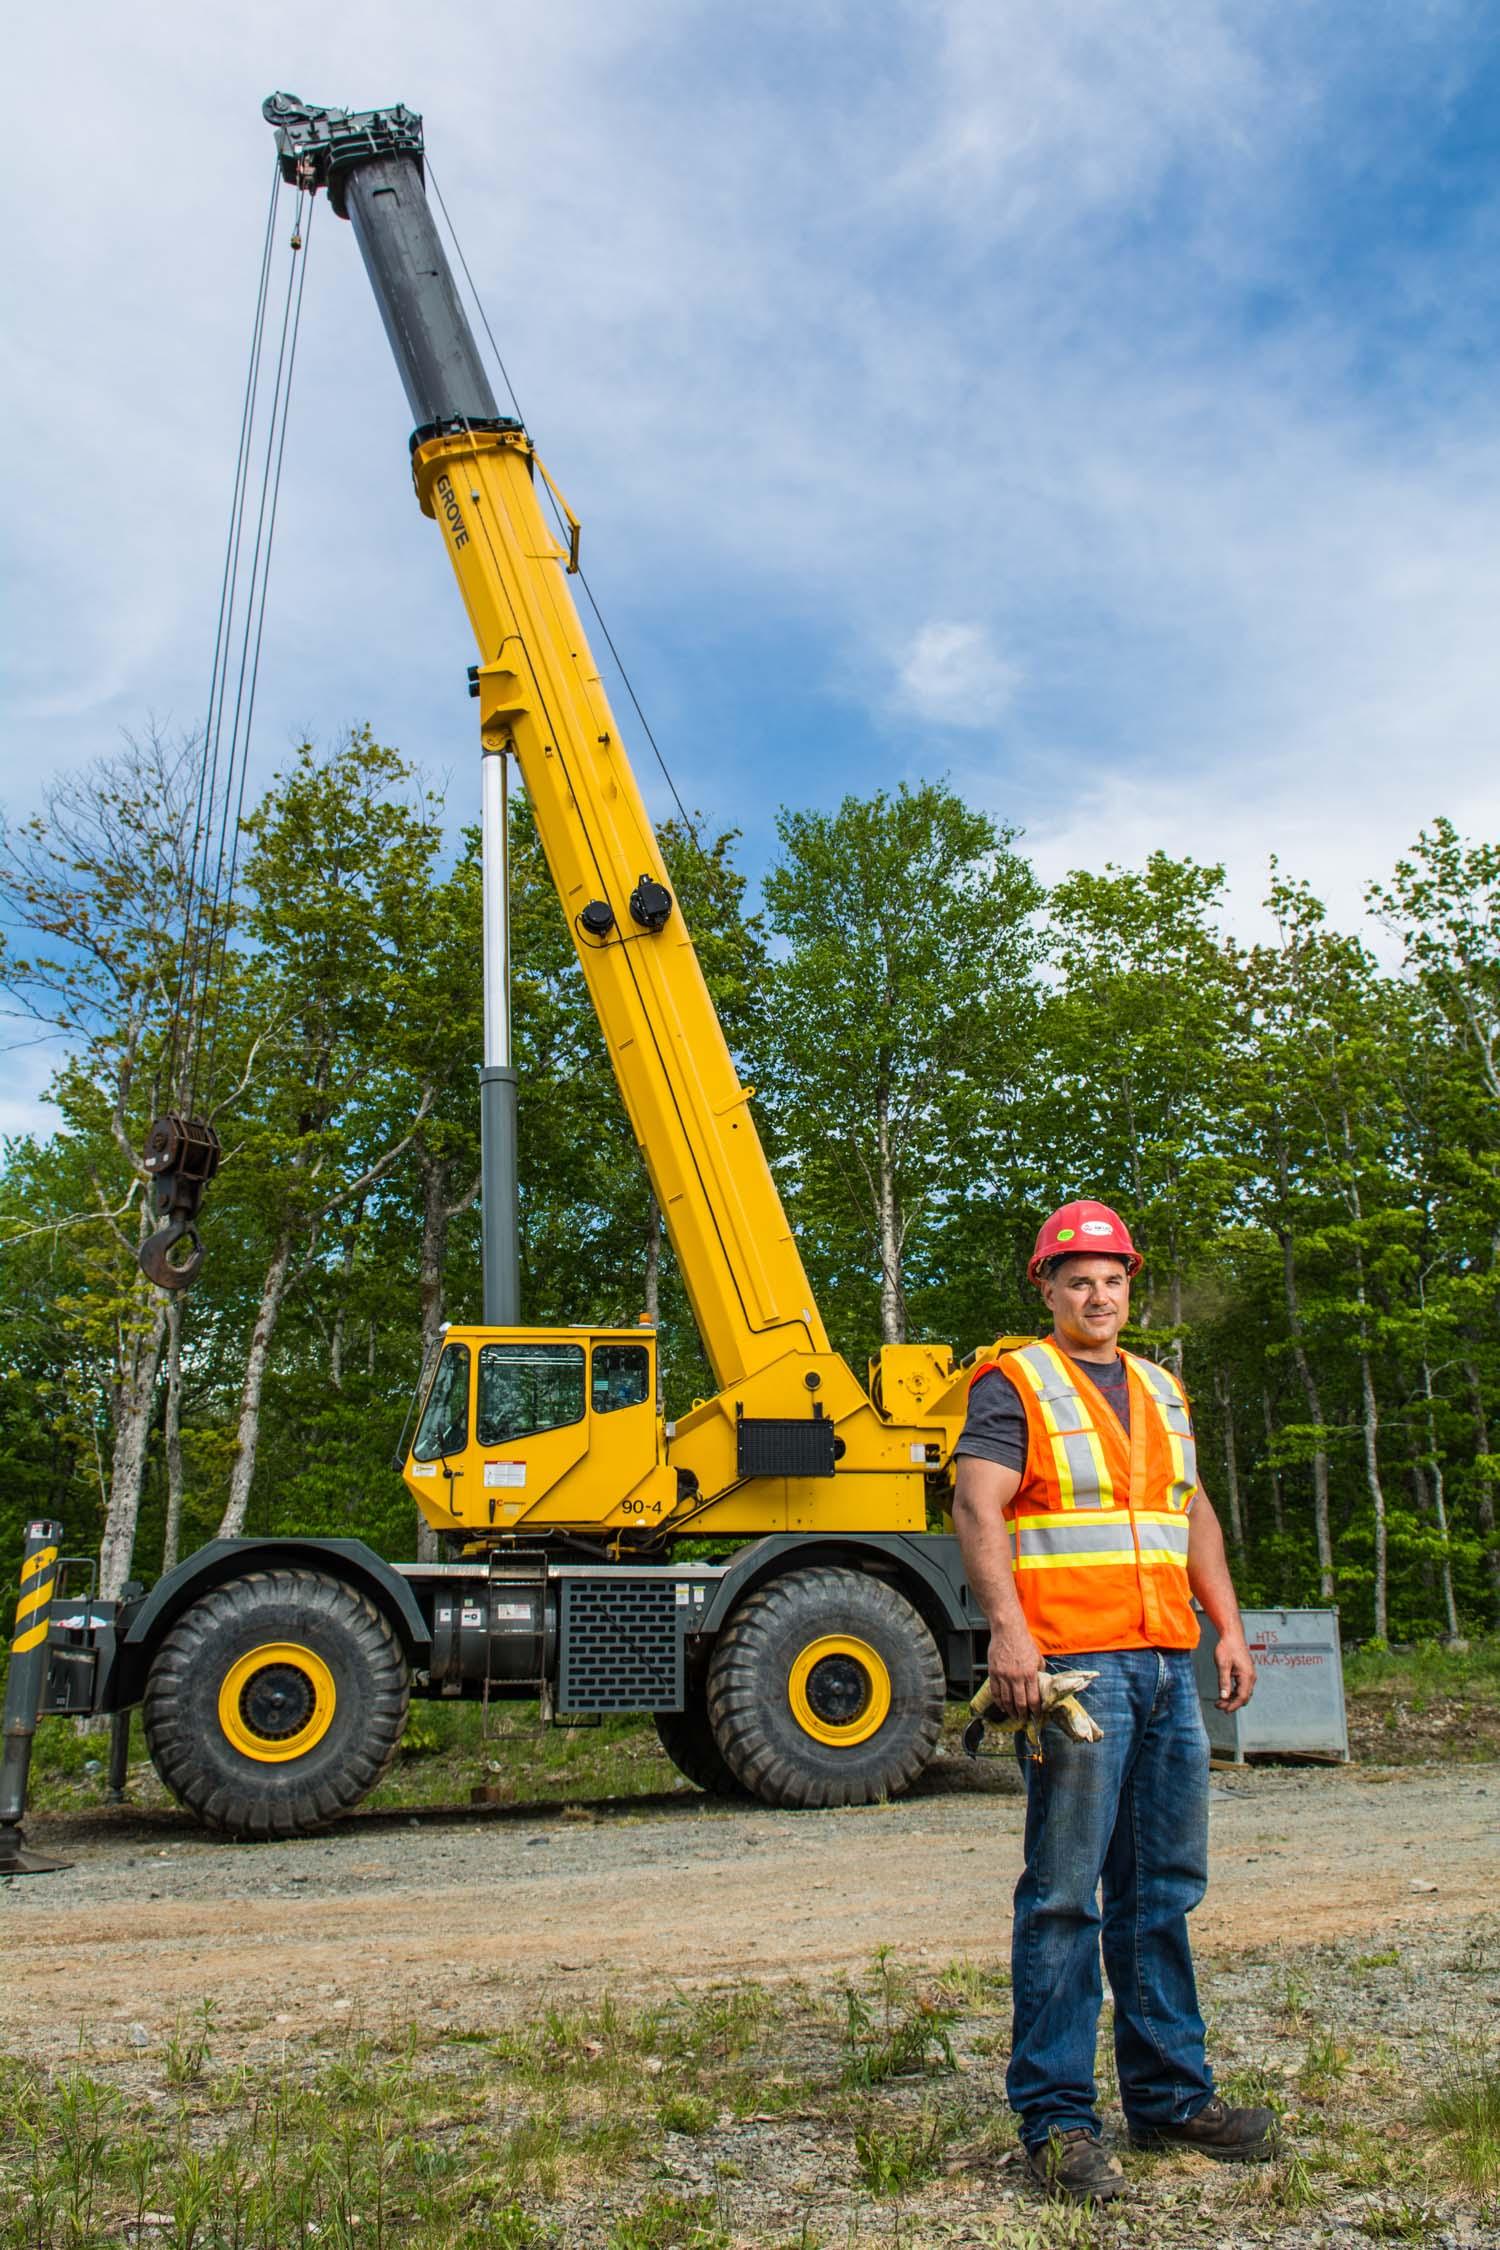 june09 2014-A. W. Leil Cranes and Equipment Limited-promo-Antigonish NS-photo by Aaron McKenzie Fraser-www.amfraser.com-7297.jpg